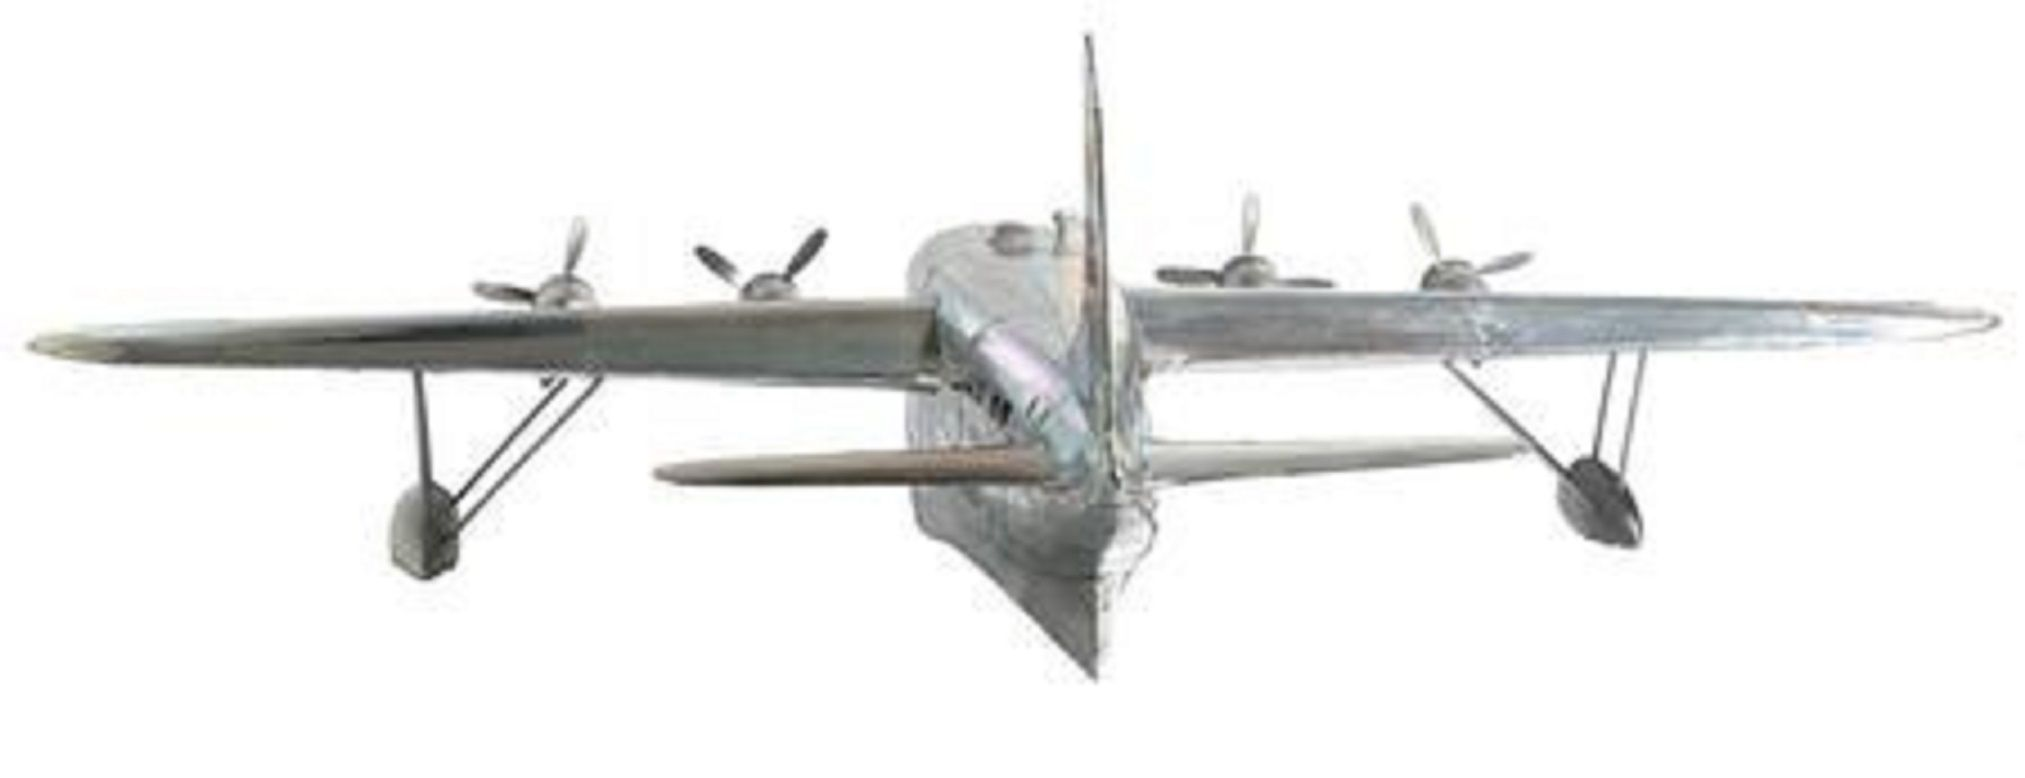 213-6890-Aquila-Airways-Model-Plane-Premier-Range